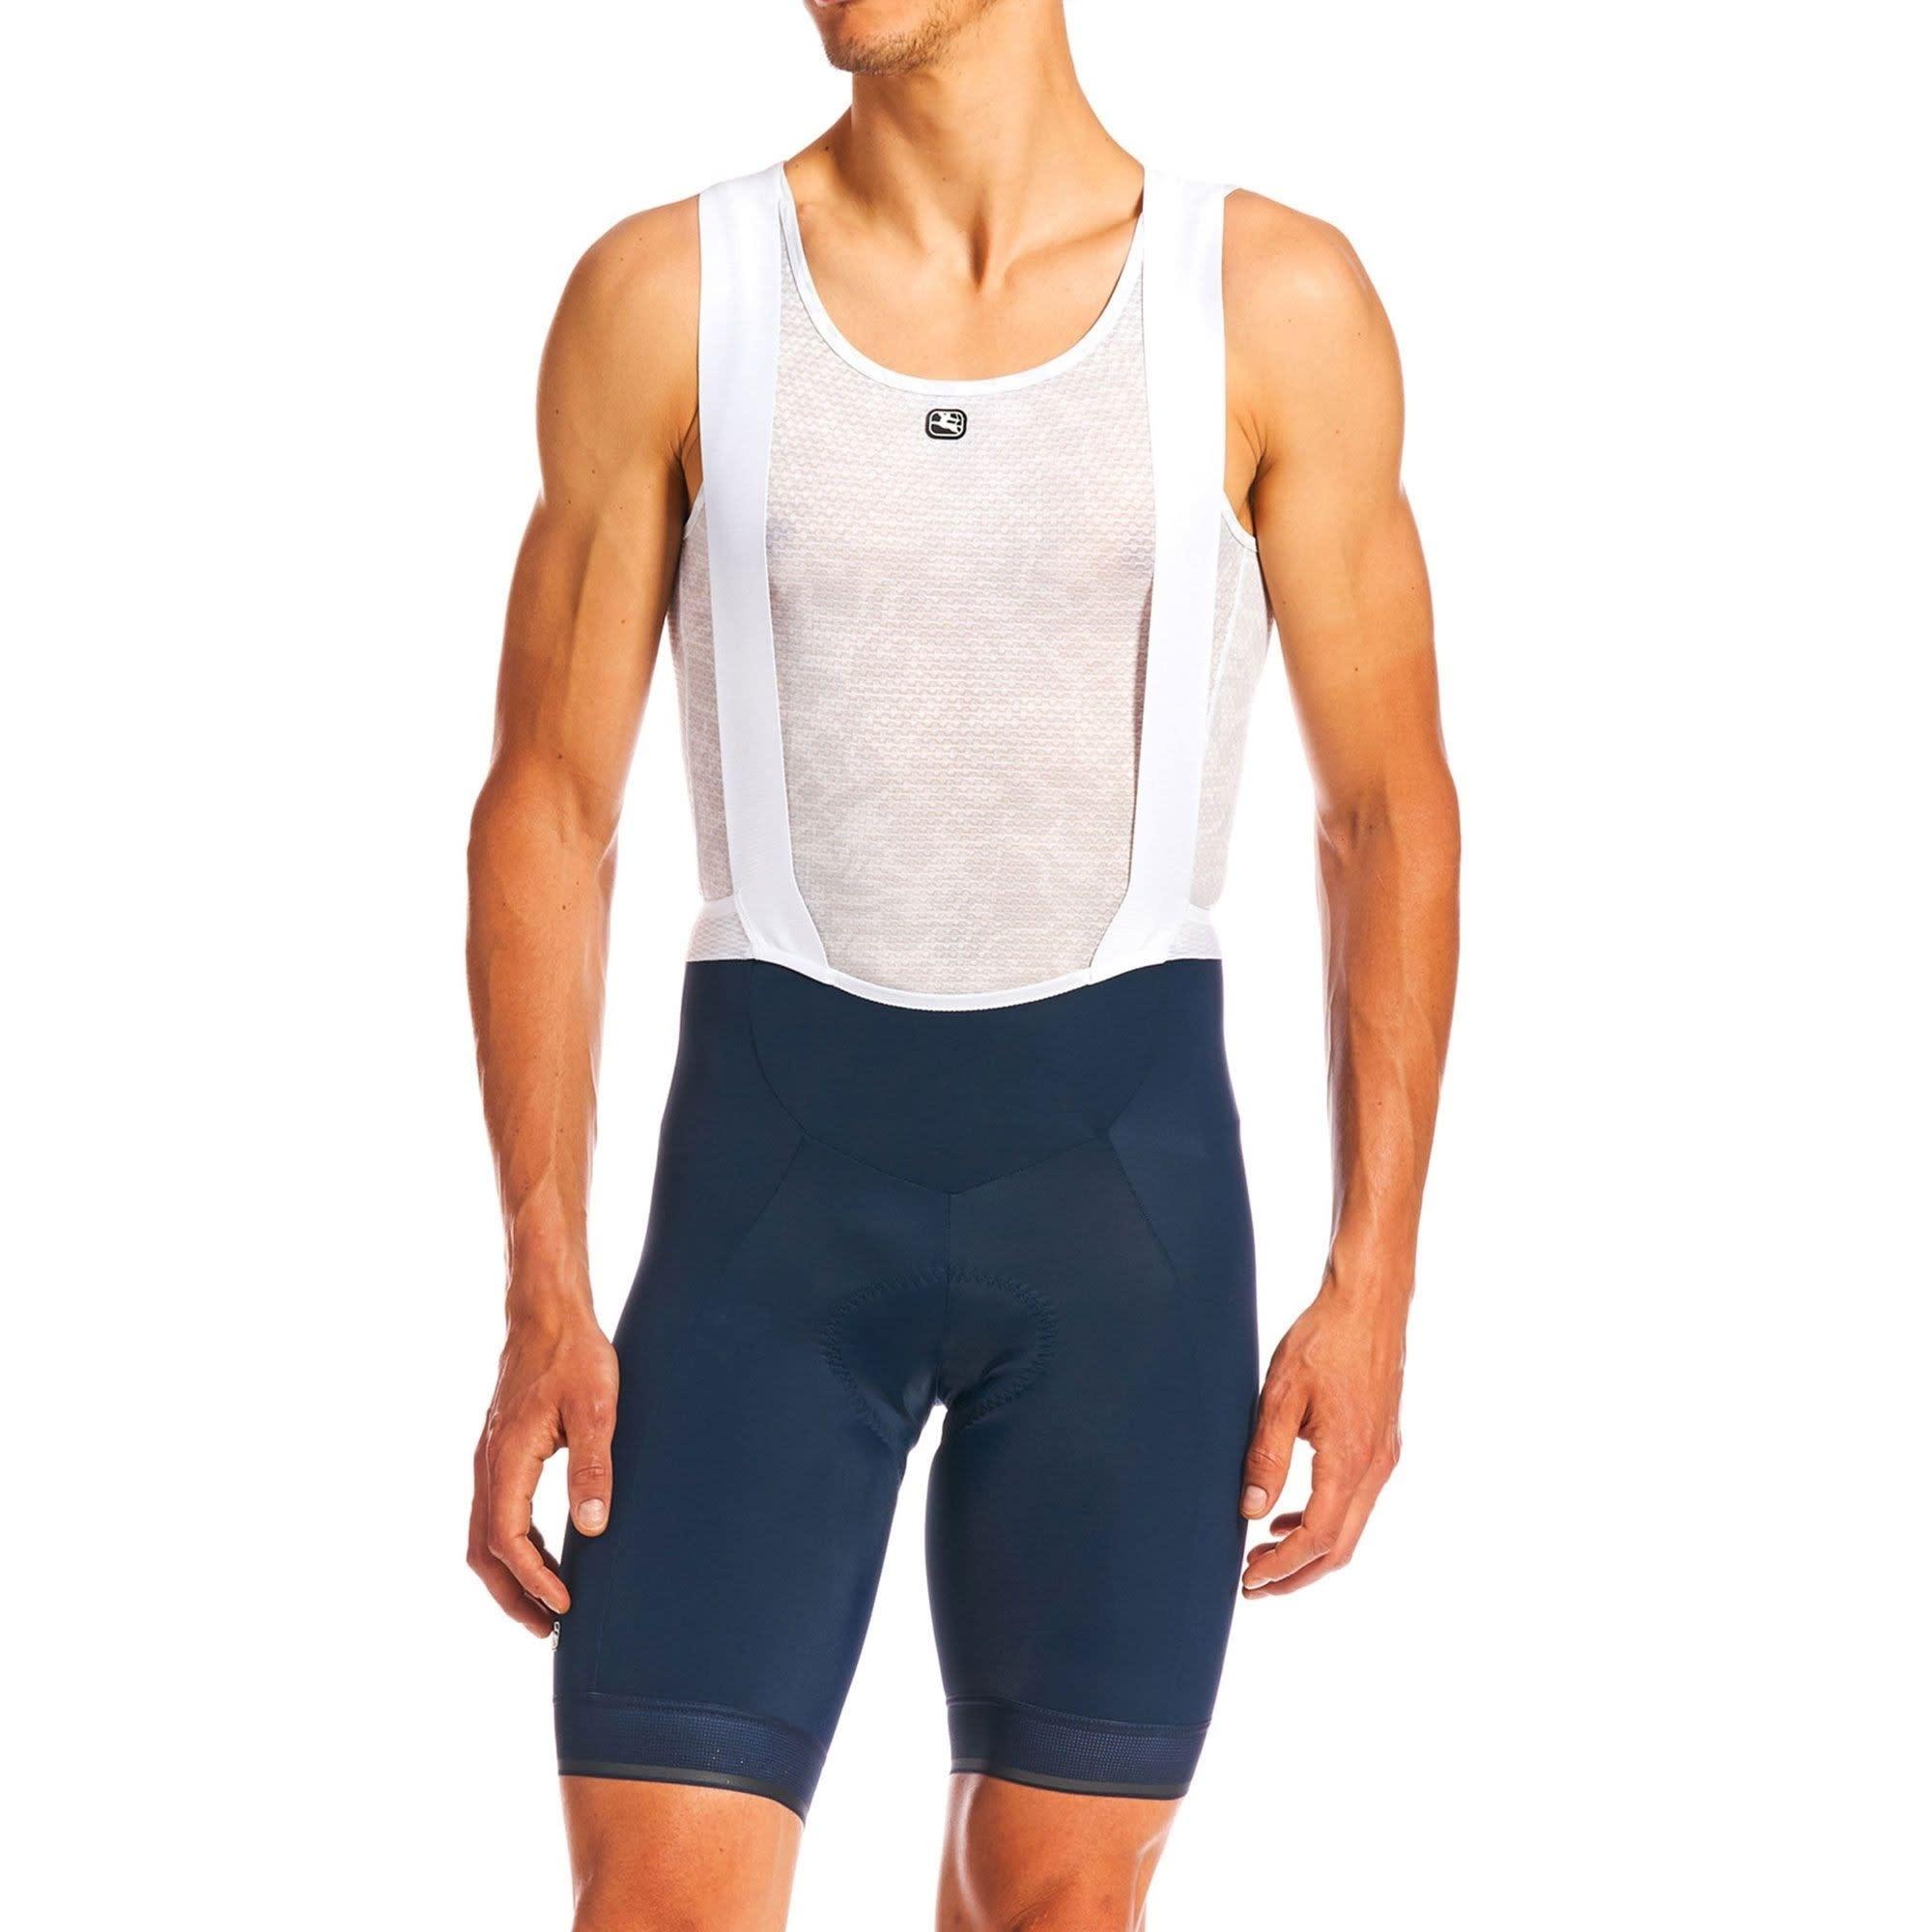 Giordana Giordana fusion bib shorts - Midnight Blue/Reflec - 3XL